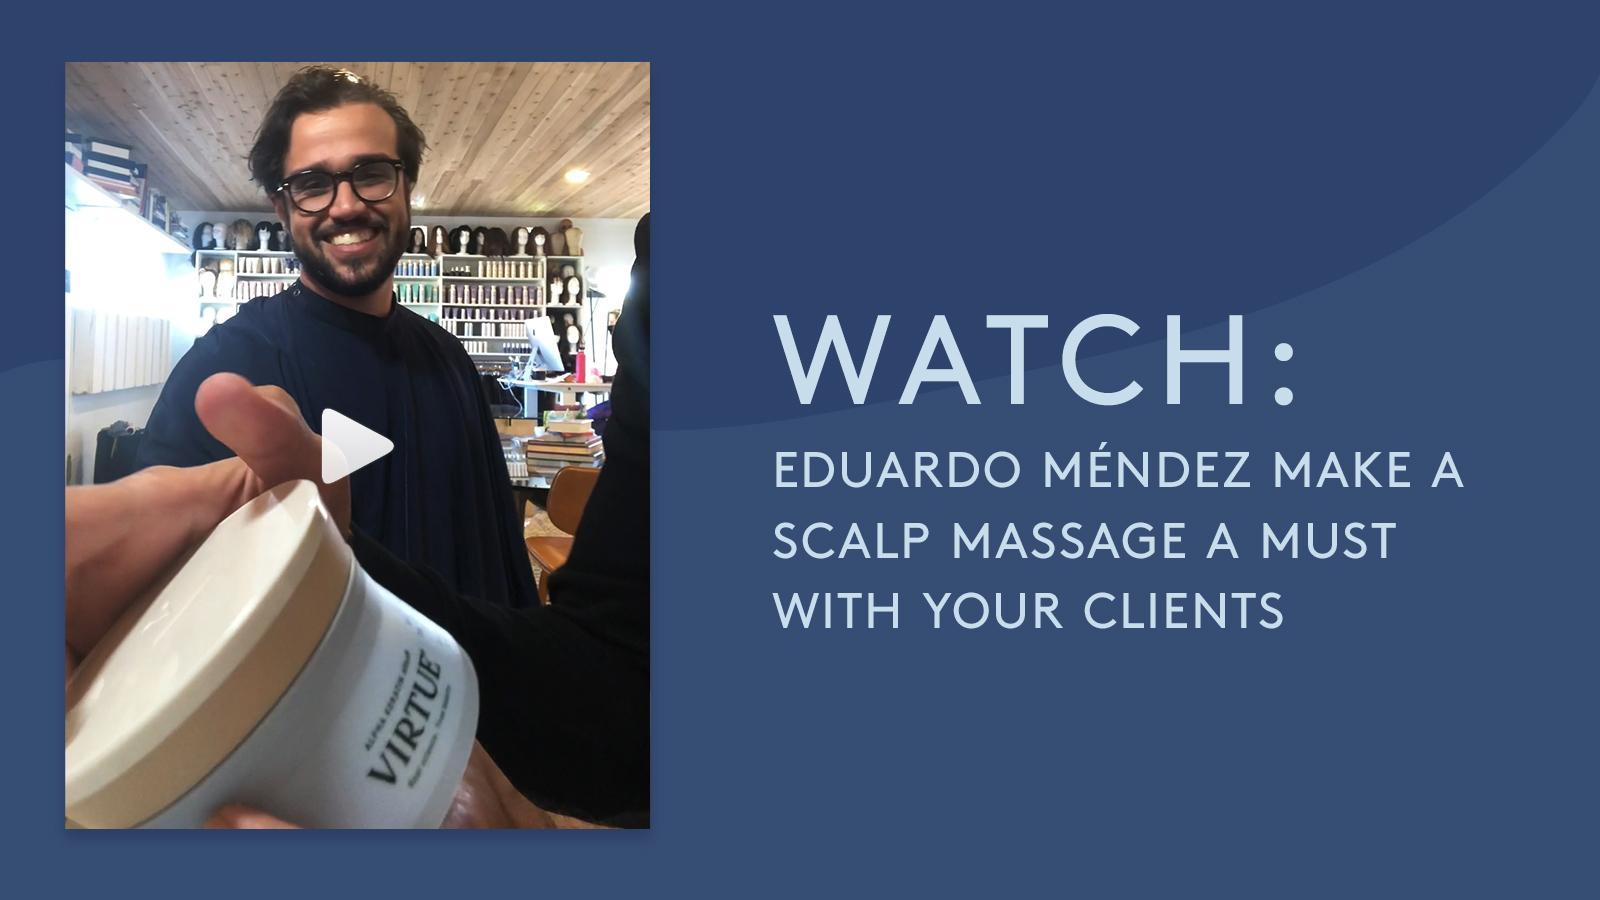 How To Make A Scalp Massage A Must With Eduardo Méndez